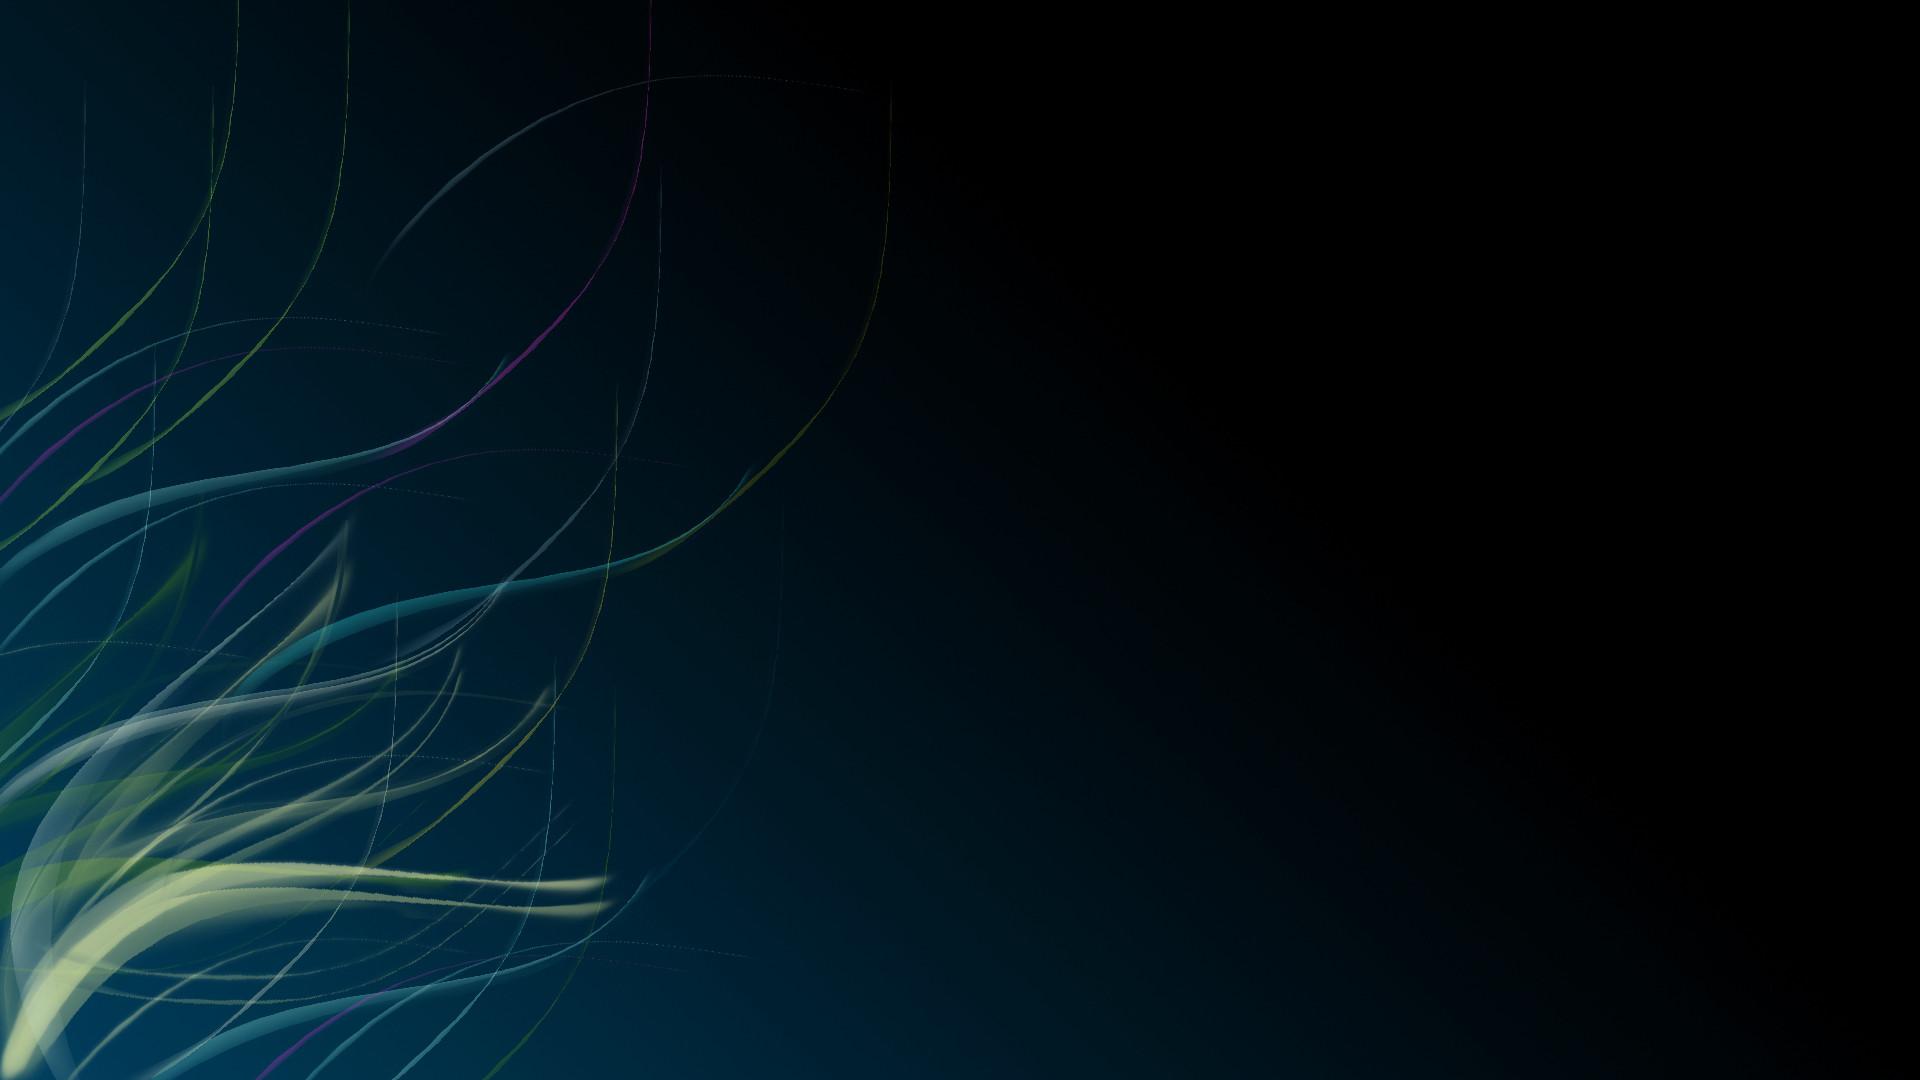 Res: 1920x1080, HD Black Elegant Backgrounds.